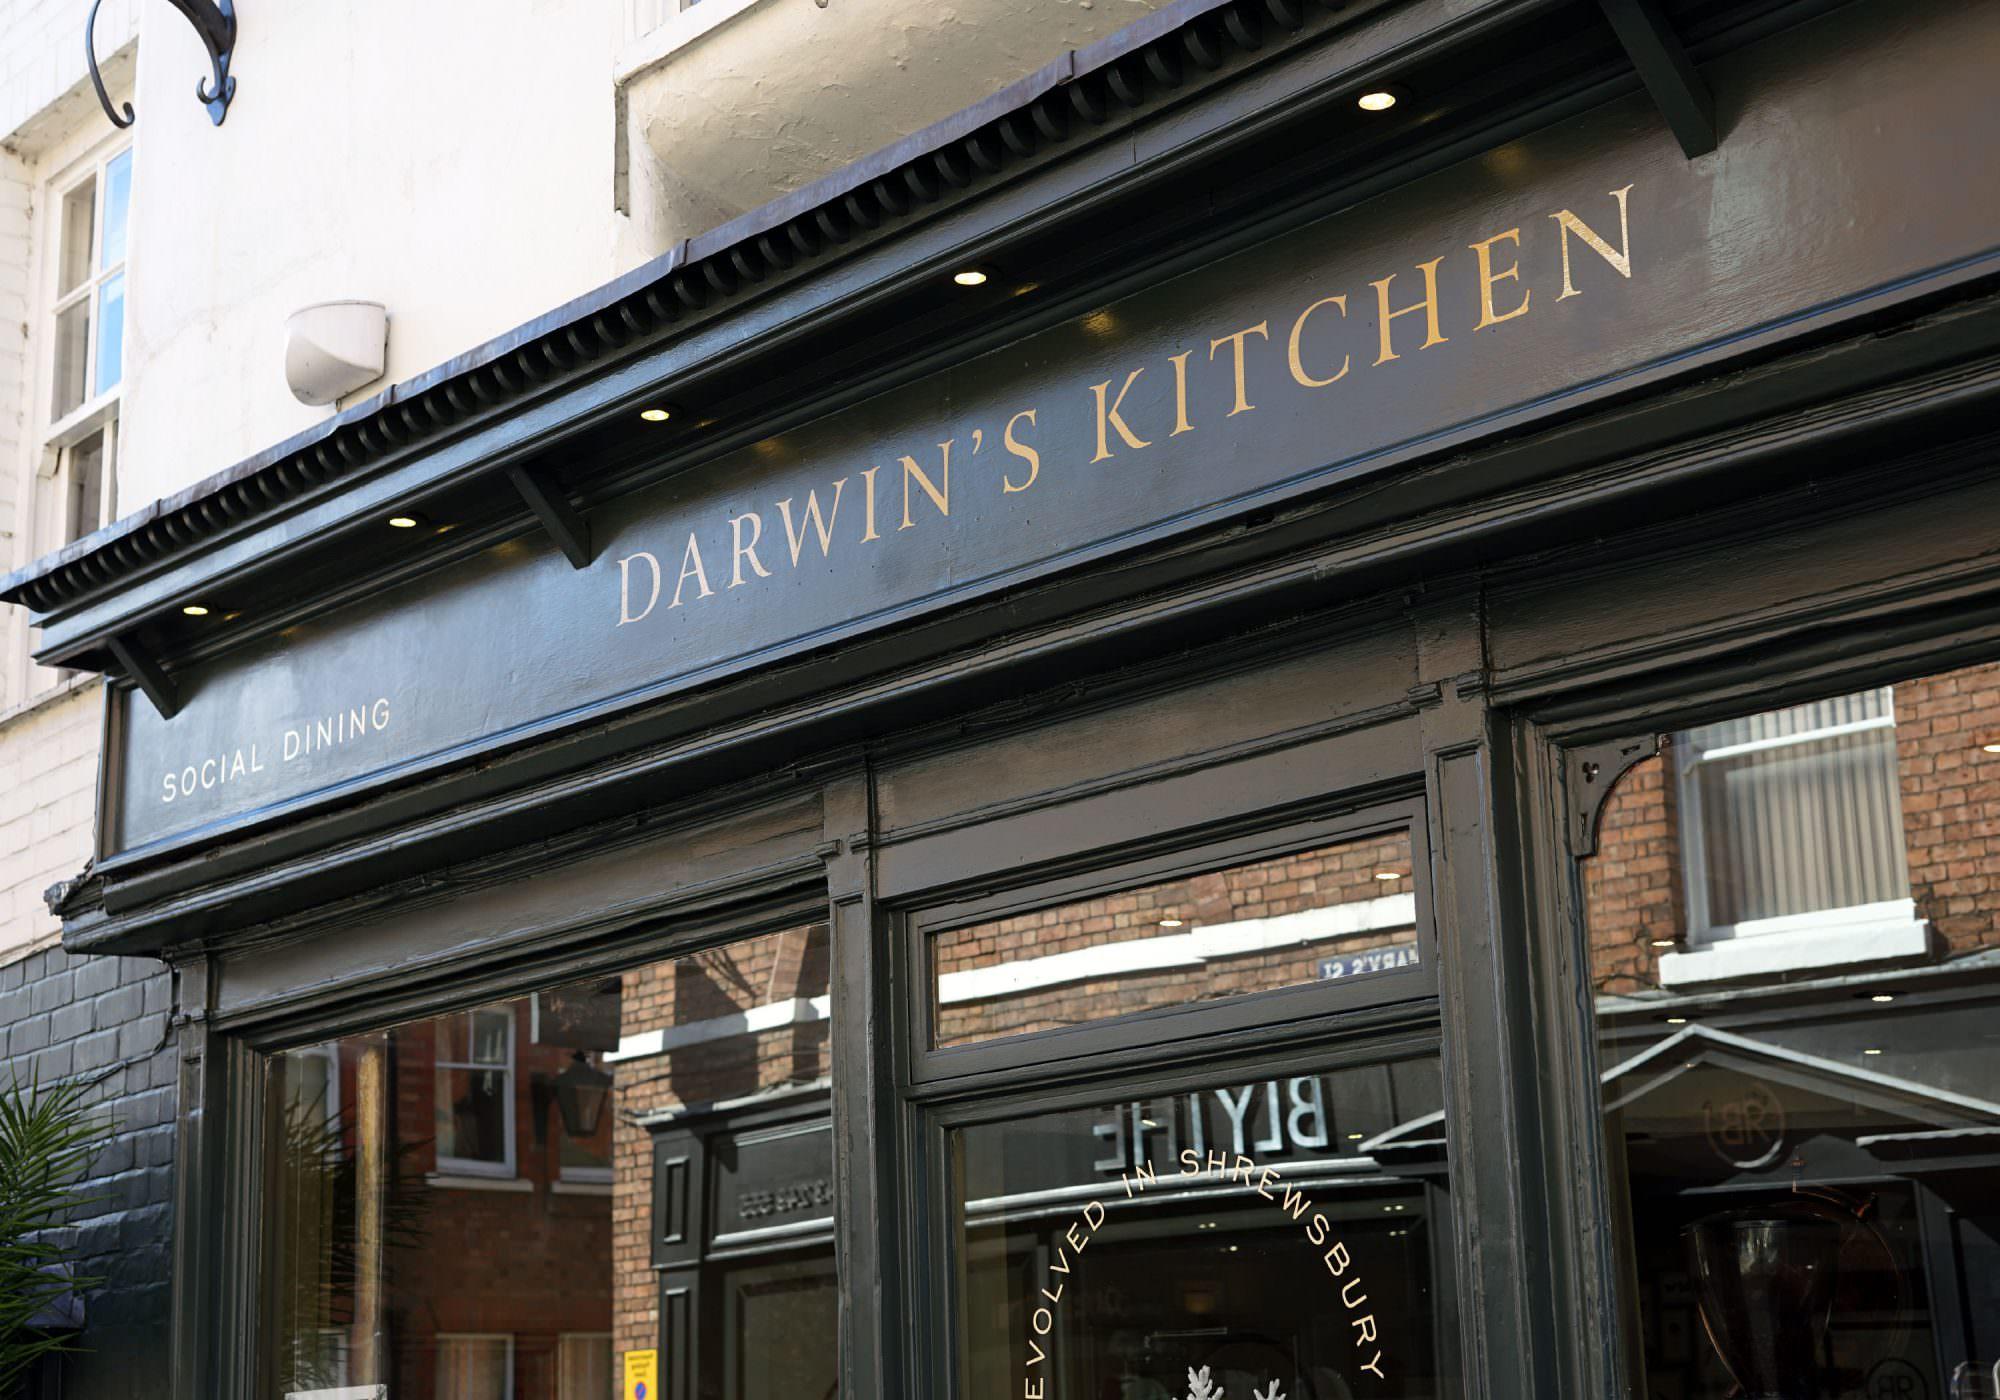 Darwin's Kitchen - Branding, Signage, Graphics, Menus & Social Media